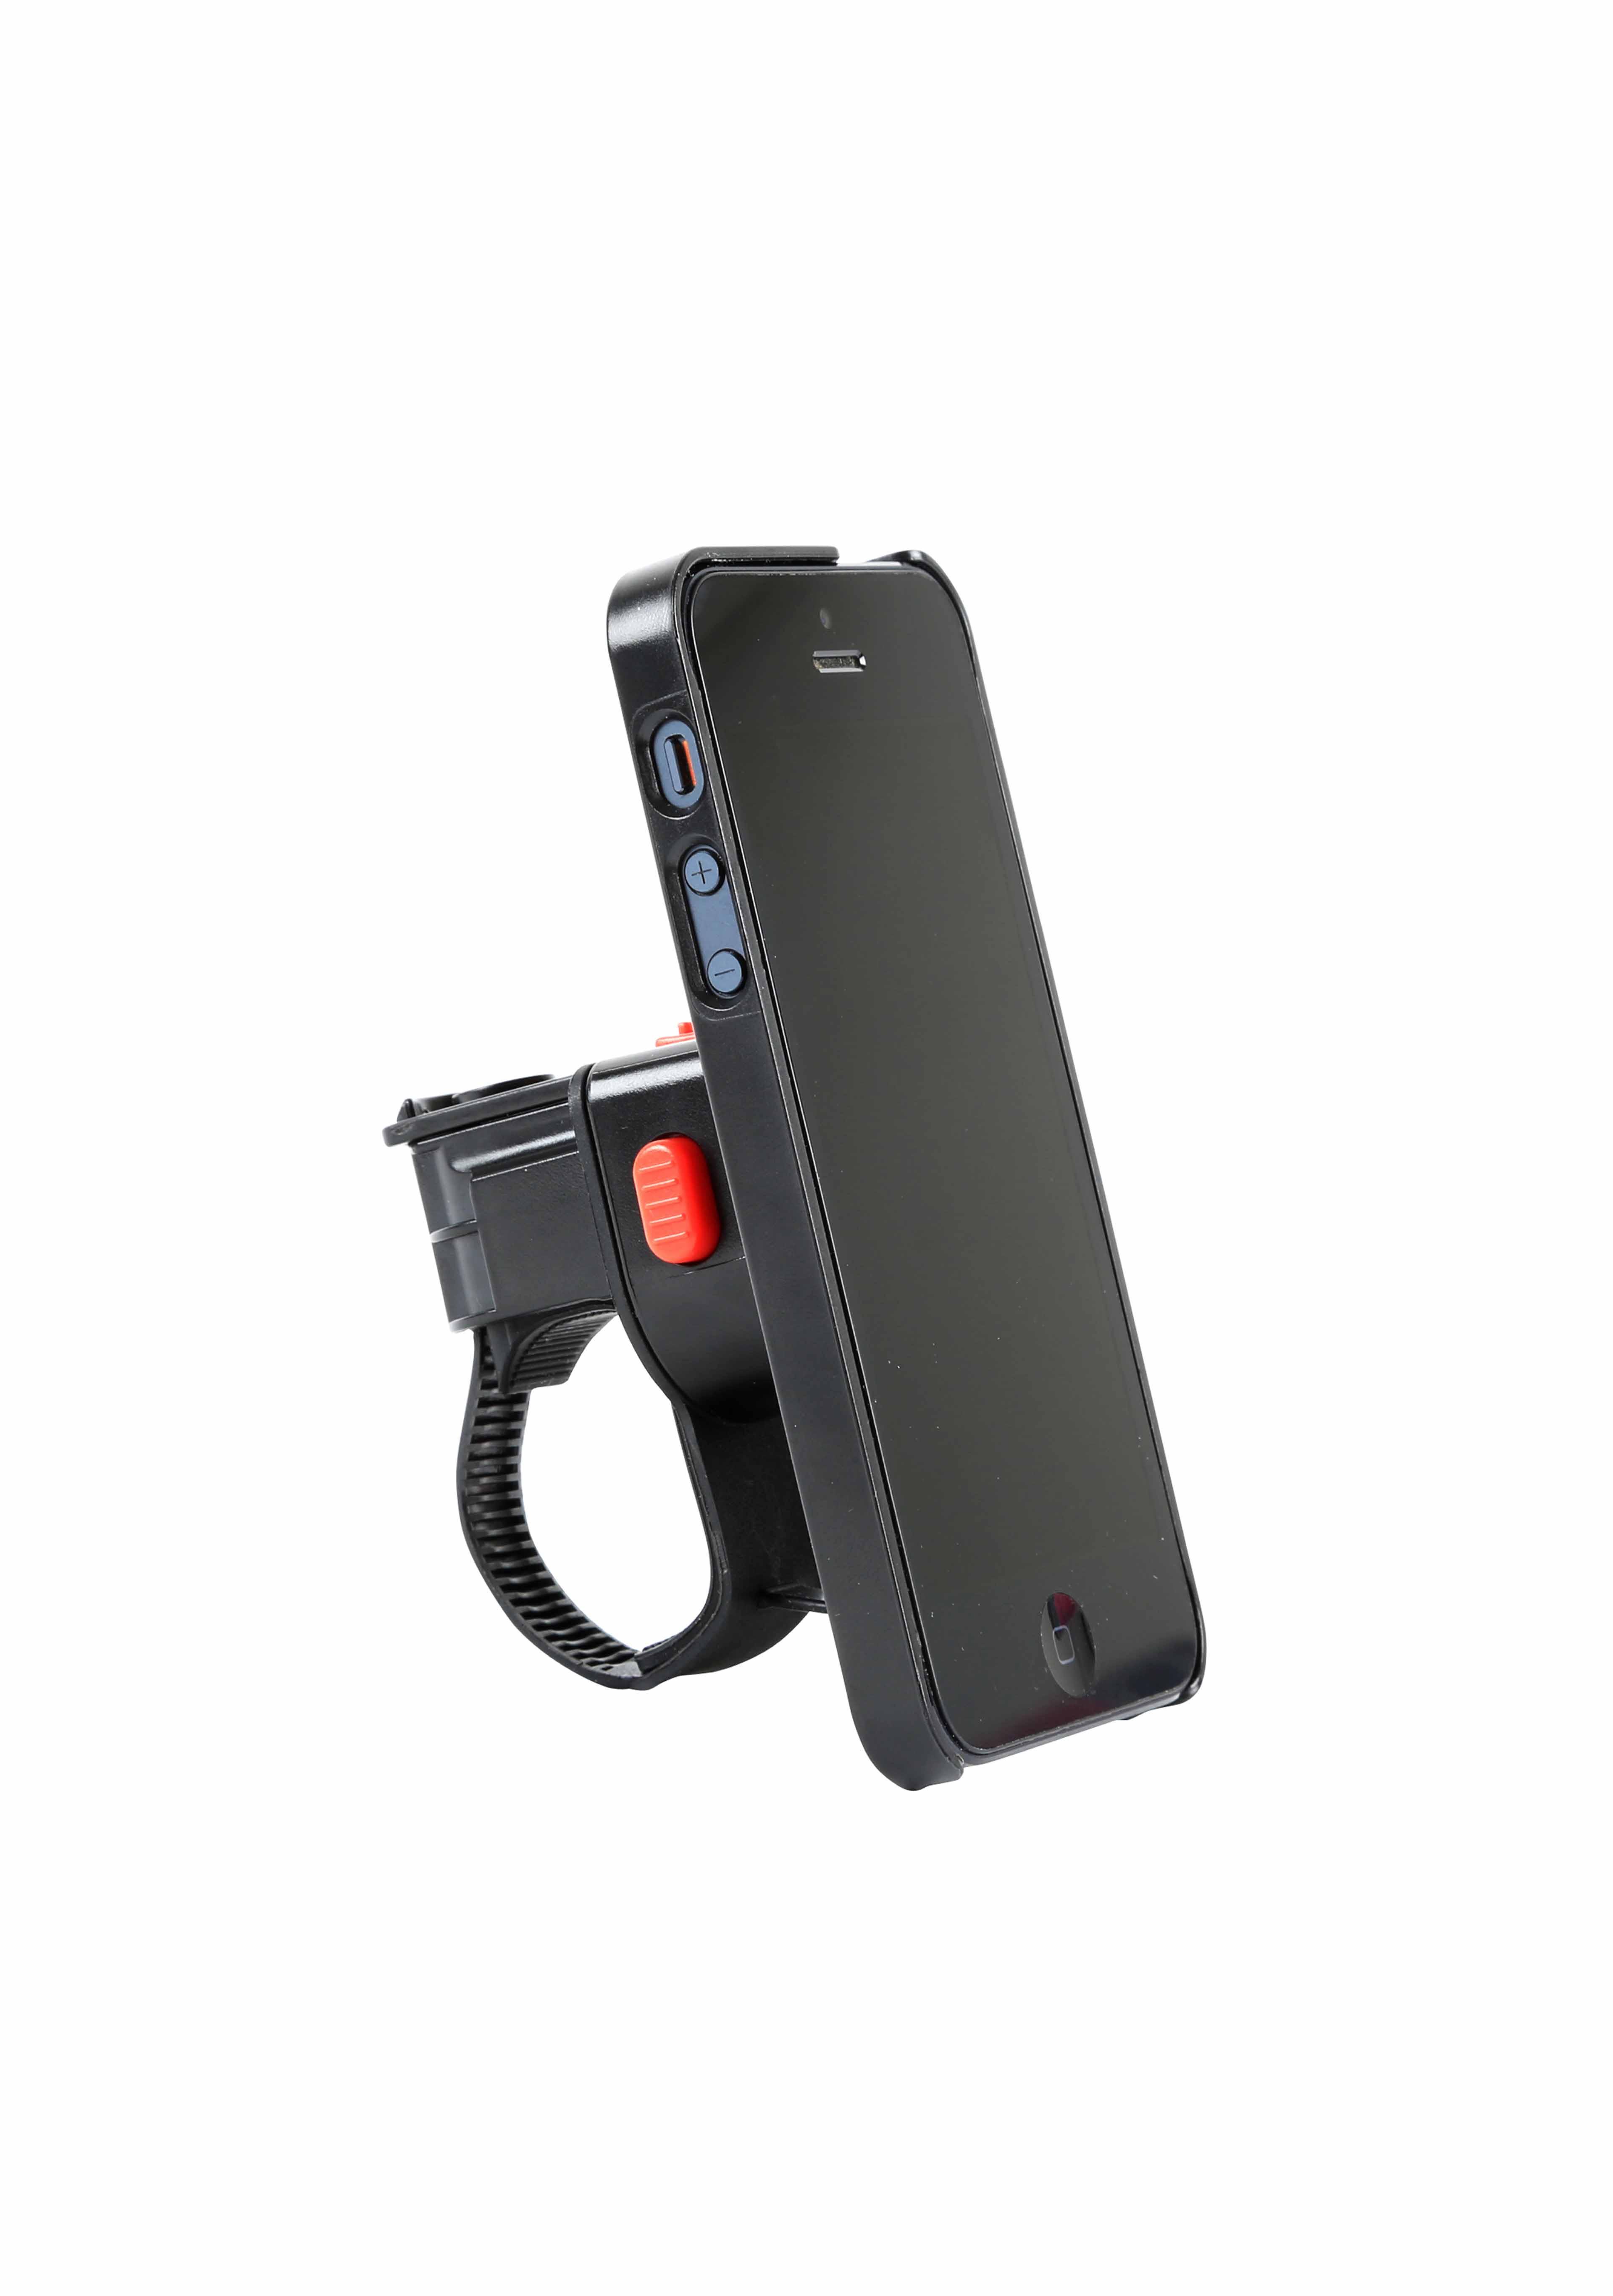 PORTACELLULARE Z CONSOLE LITE - PER iPHONE 11 PRO